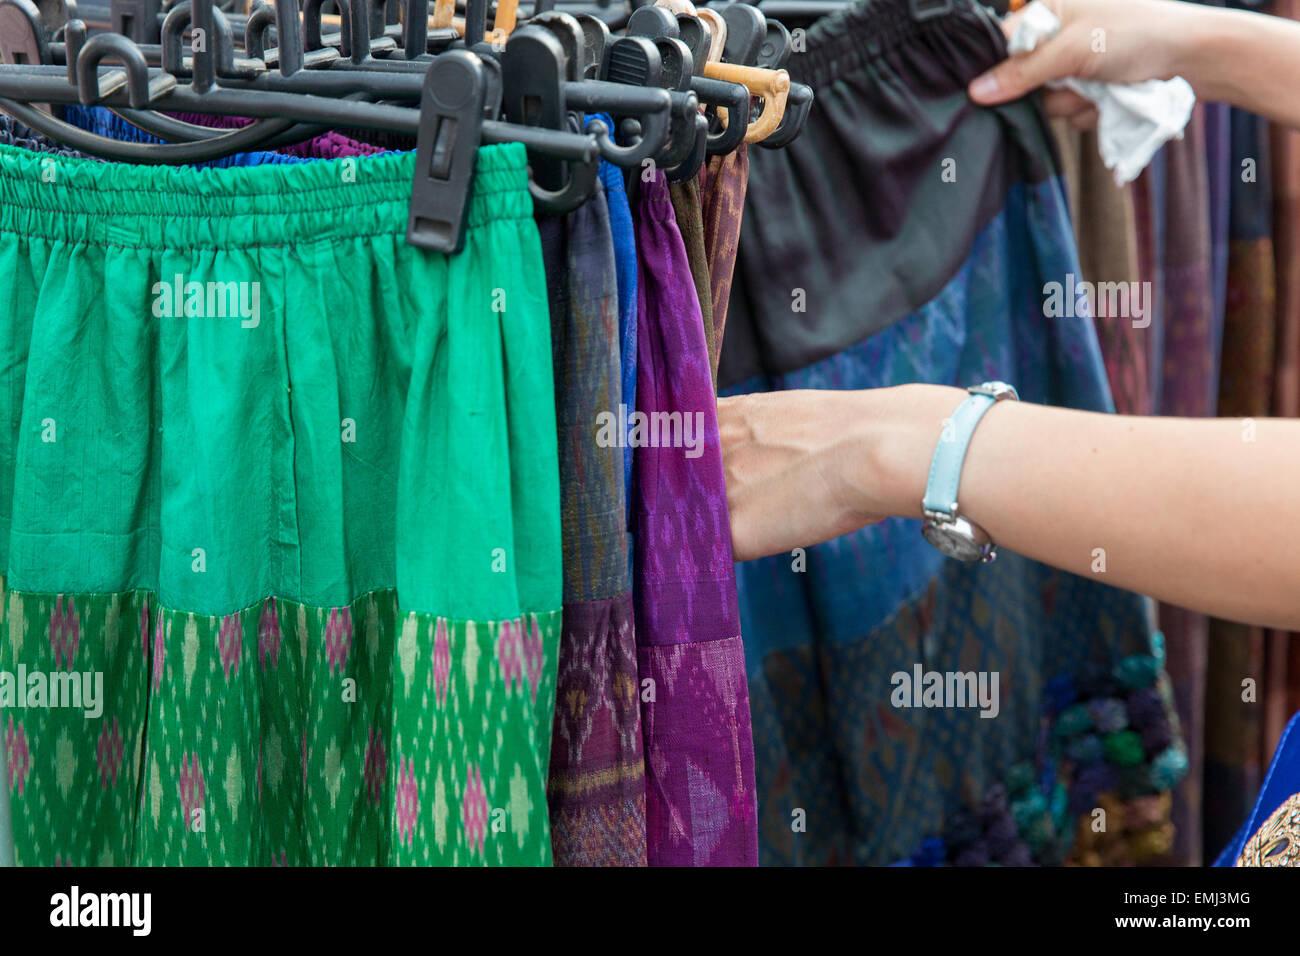 close up of hands choosing skirts at street market - Stock Image